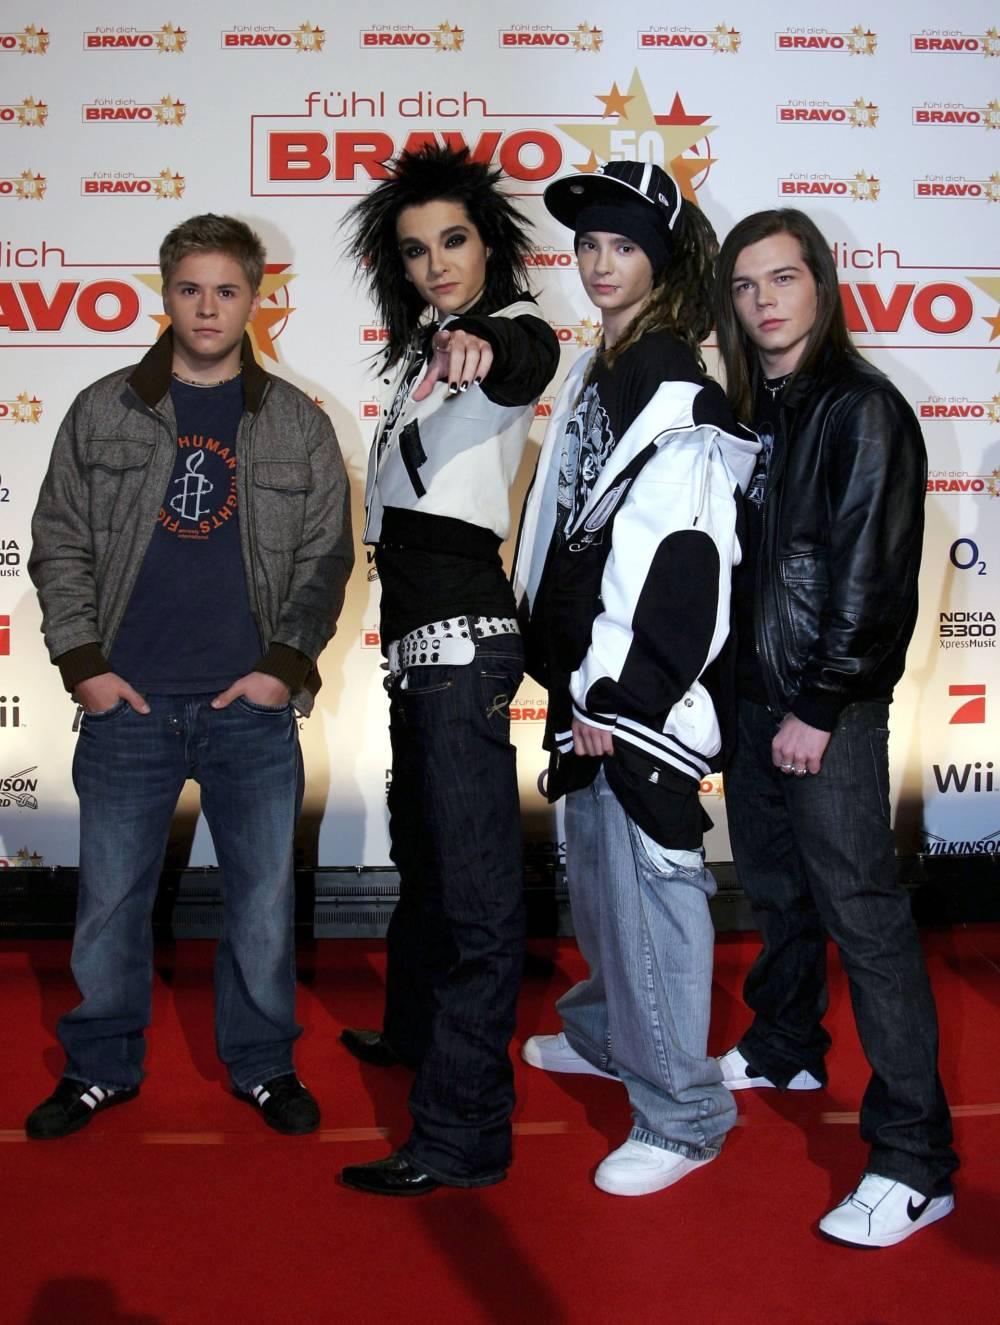 Tokio Hotel 2006